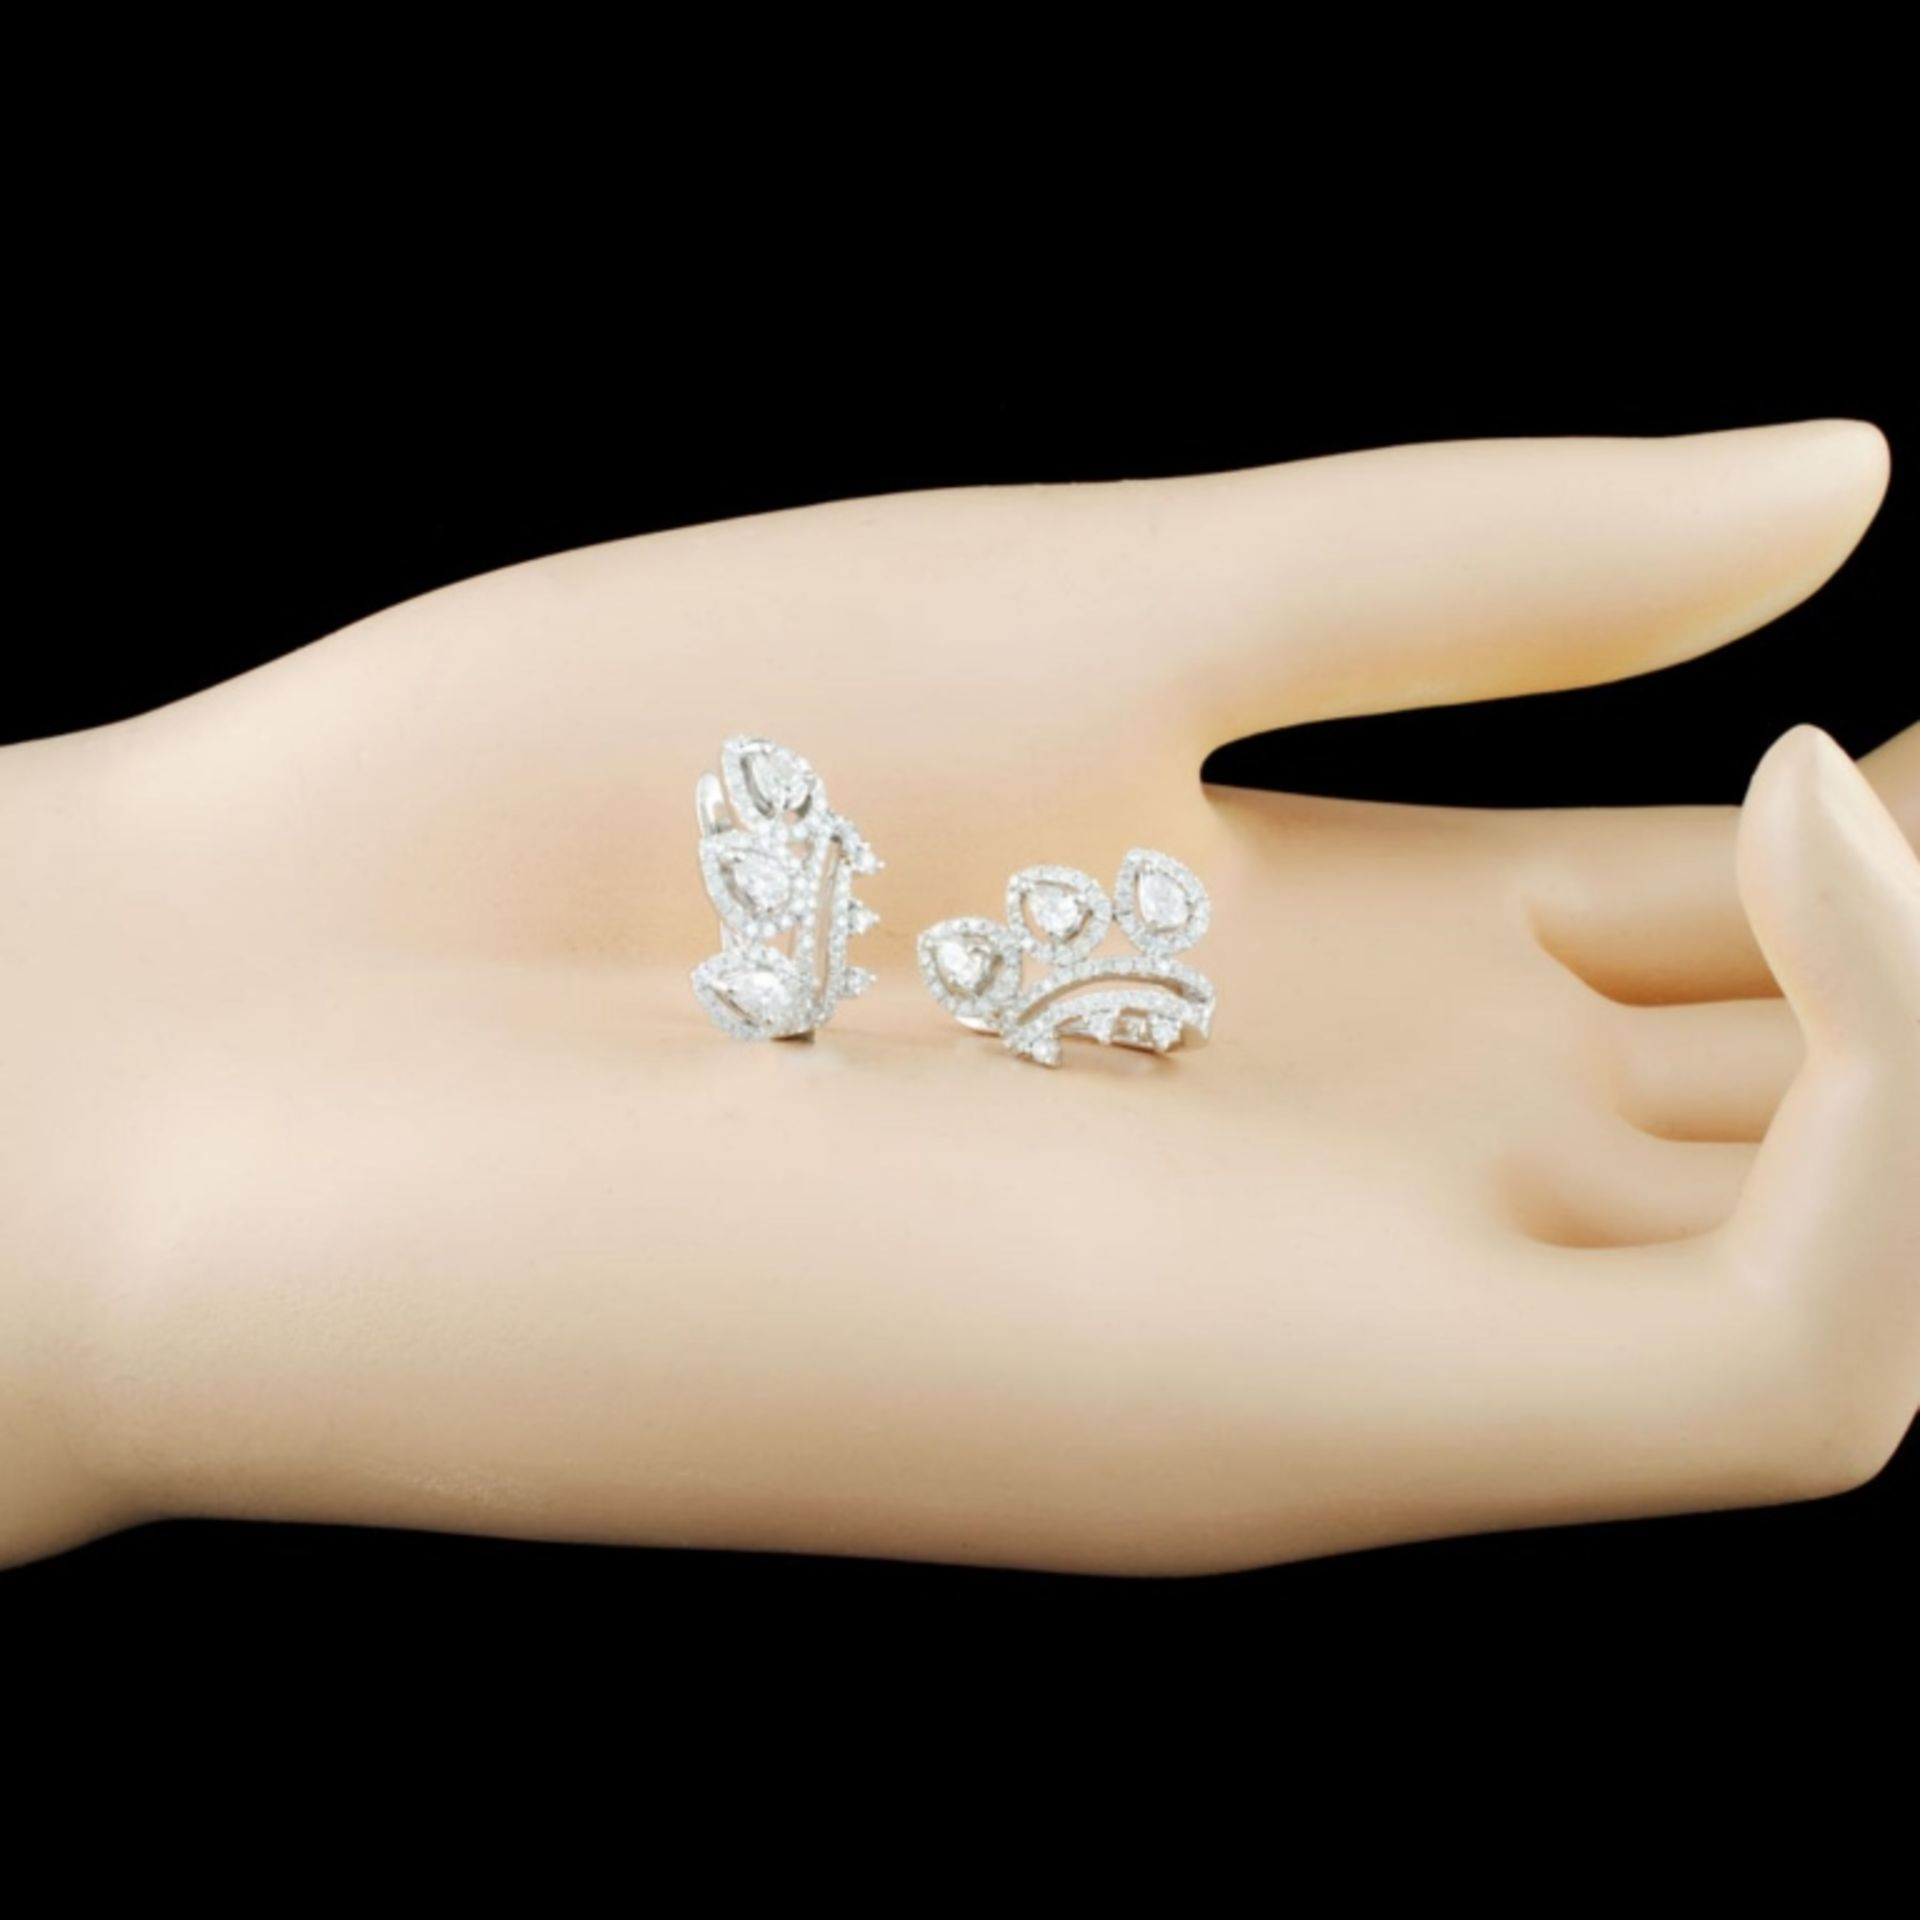 18K Gold 1.28ctw Diamond Earrings - Image 2 of 3